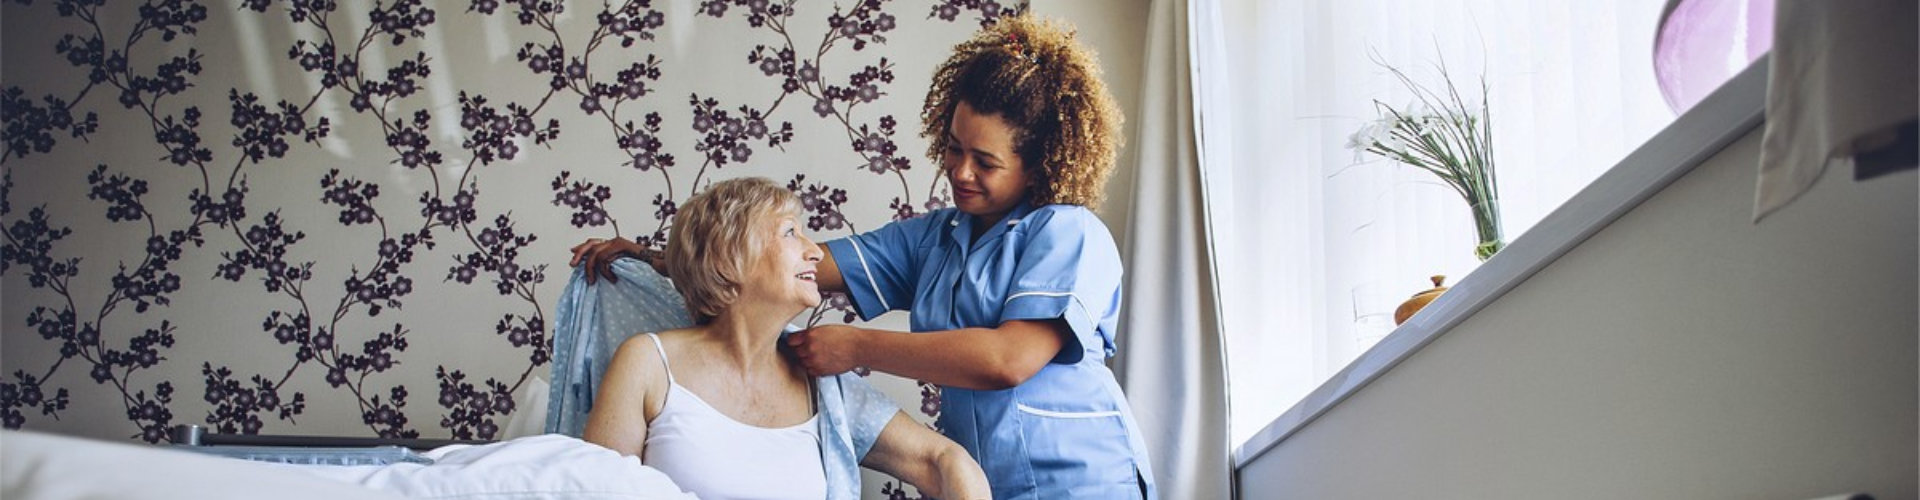 female caregiver assisting senior woman to dress up